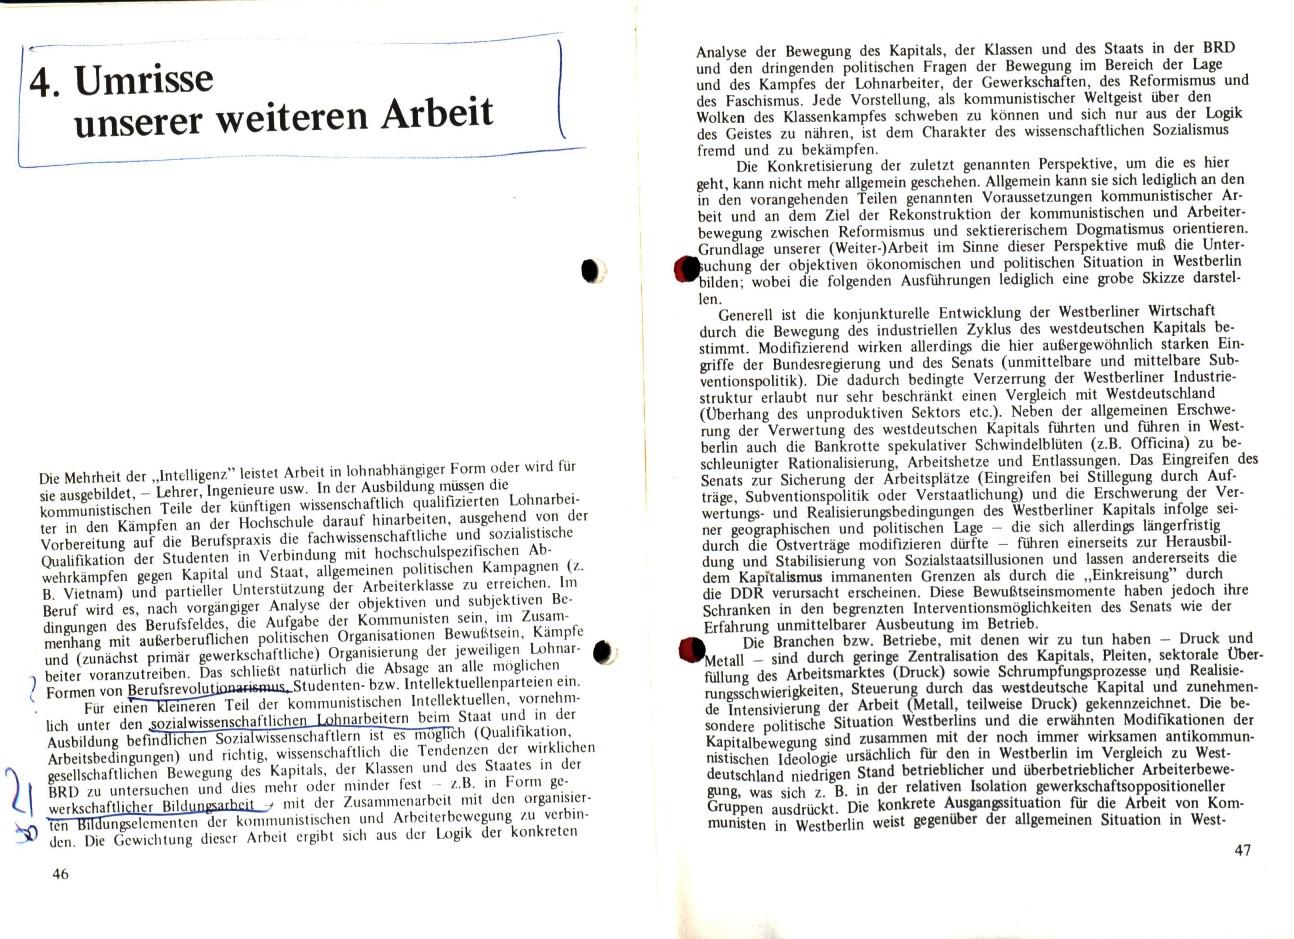 Berlin_KBML_Kommunist_1973_04s_25